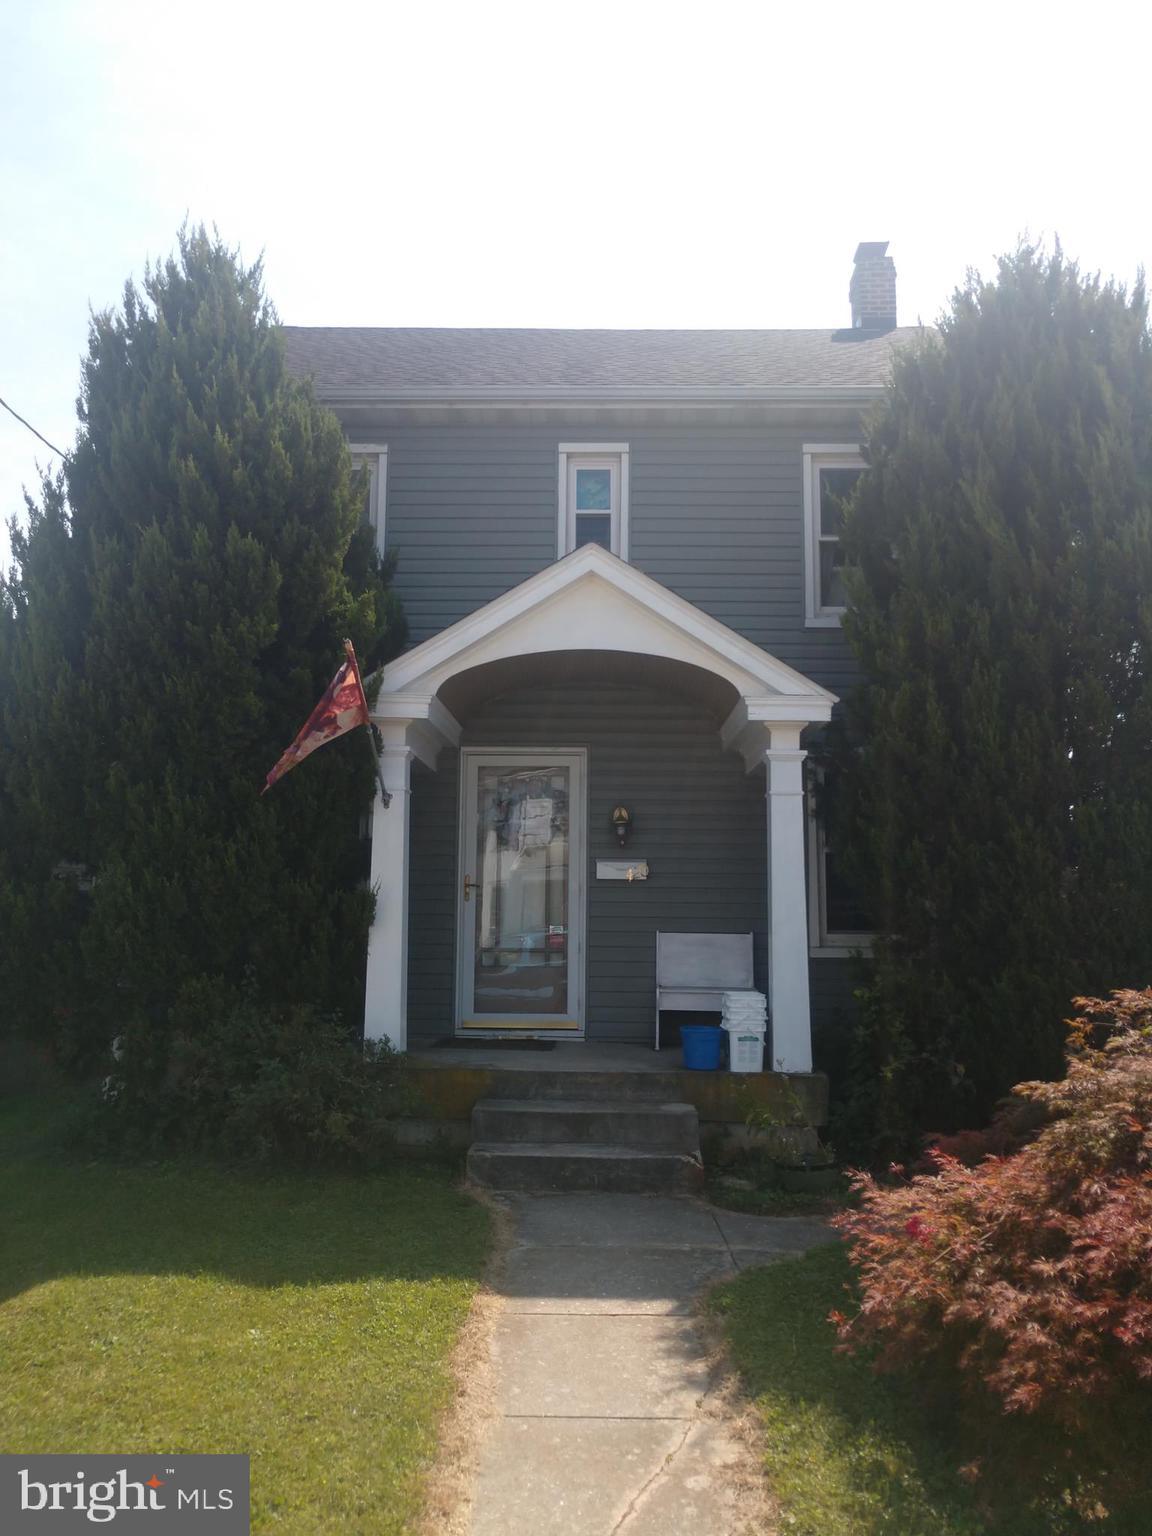 420 NORTH, MCSHERRYSTOWN, PA 17344